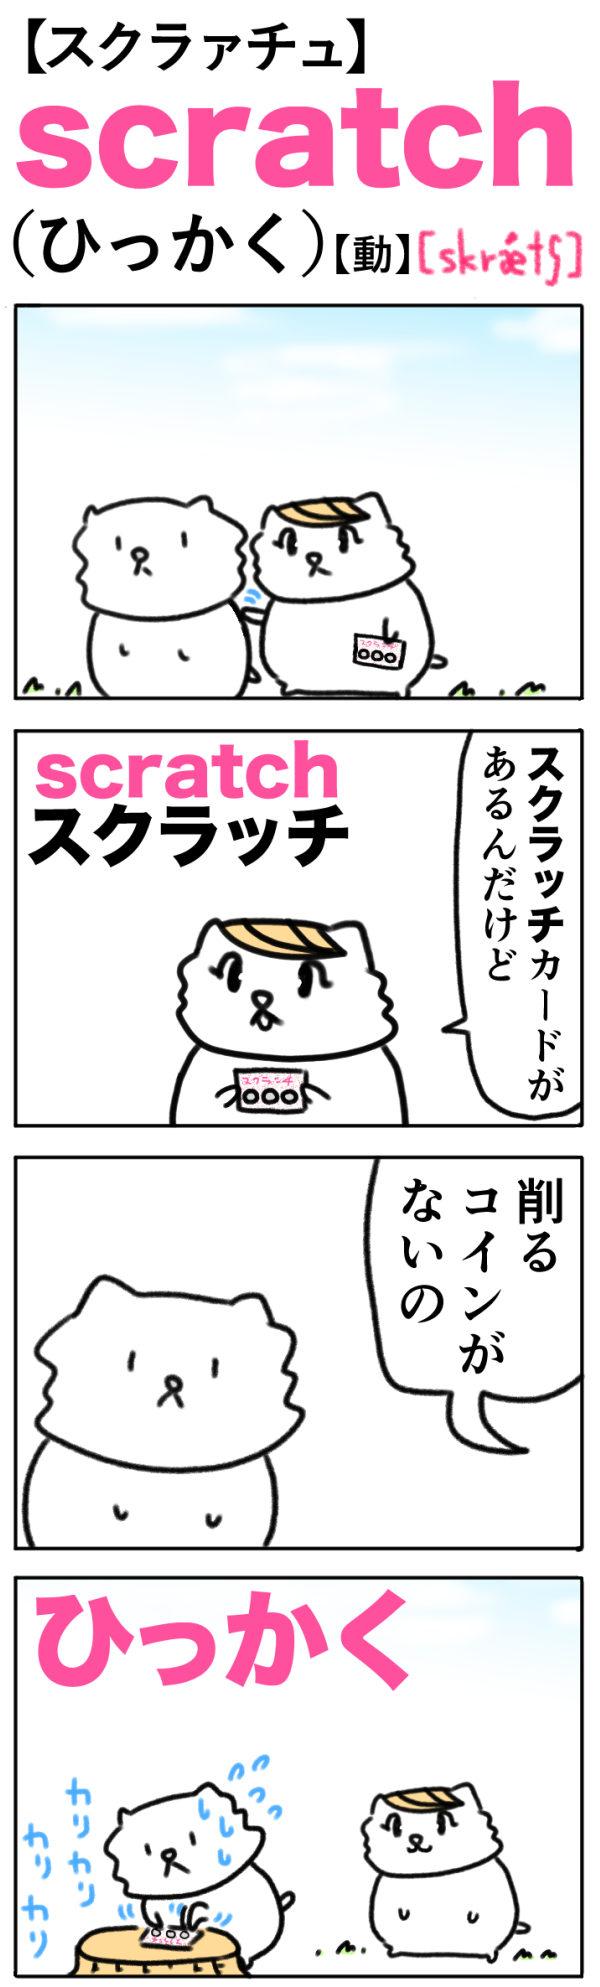 scratch(ひっかく)